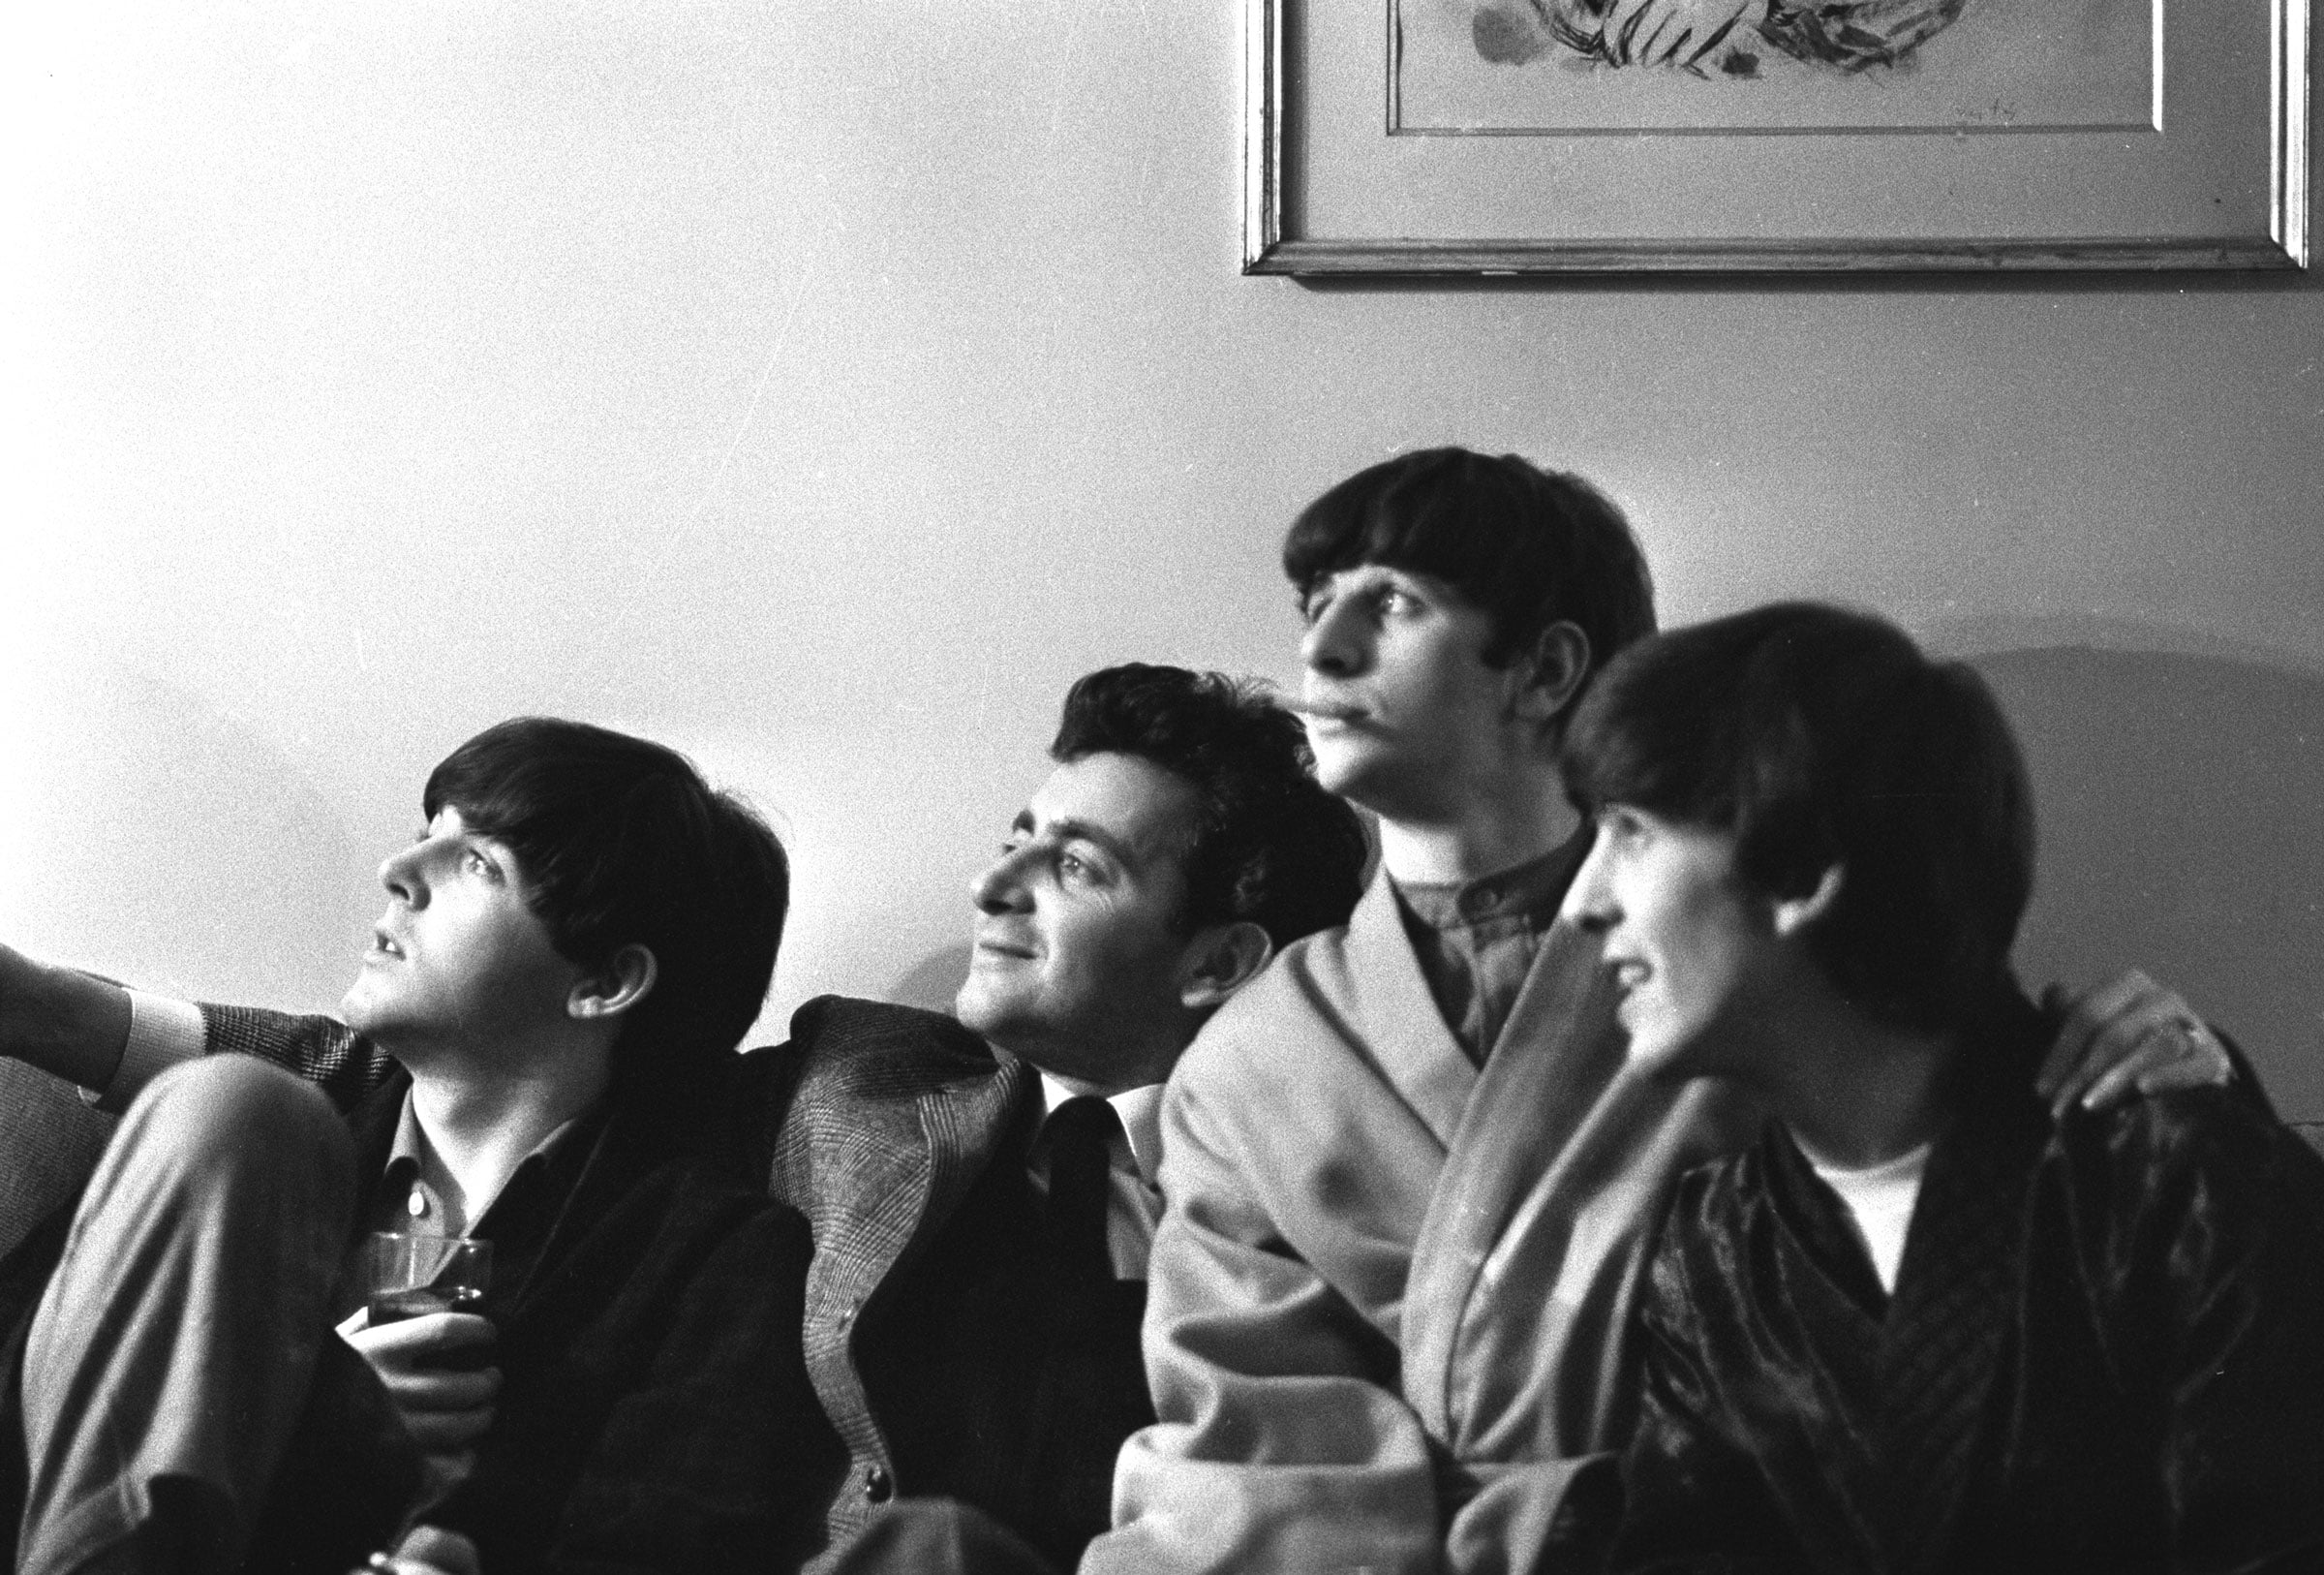 Harry-and-3-Beatles-taken-by-John.jpg